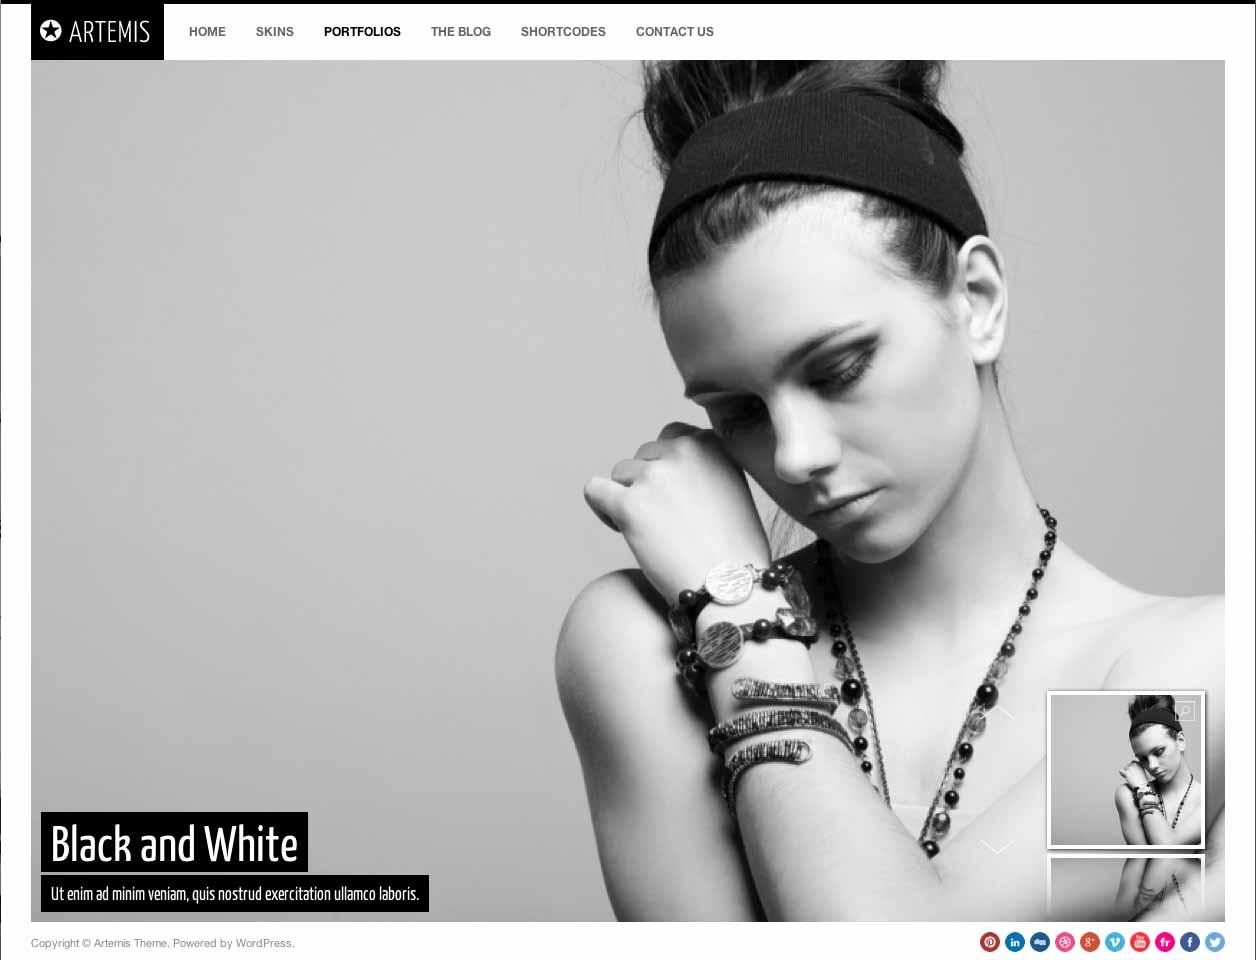 Artemis Portfolio2.jpg